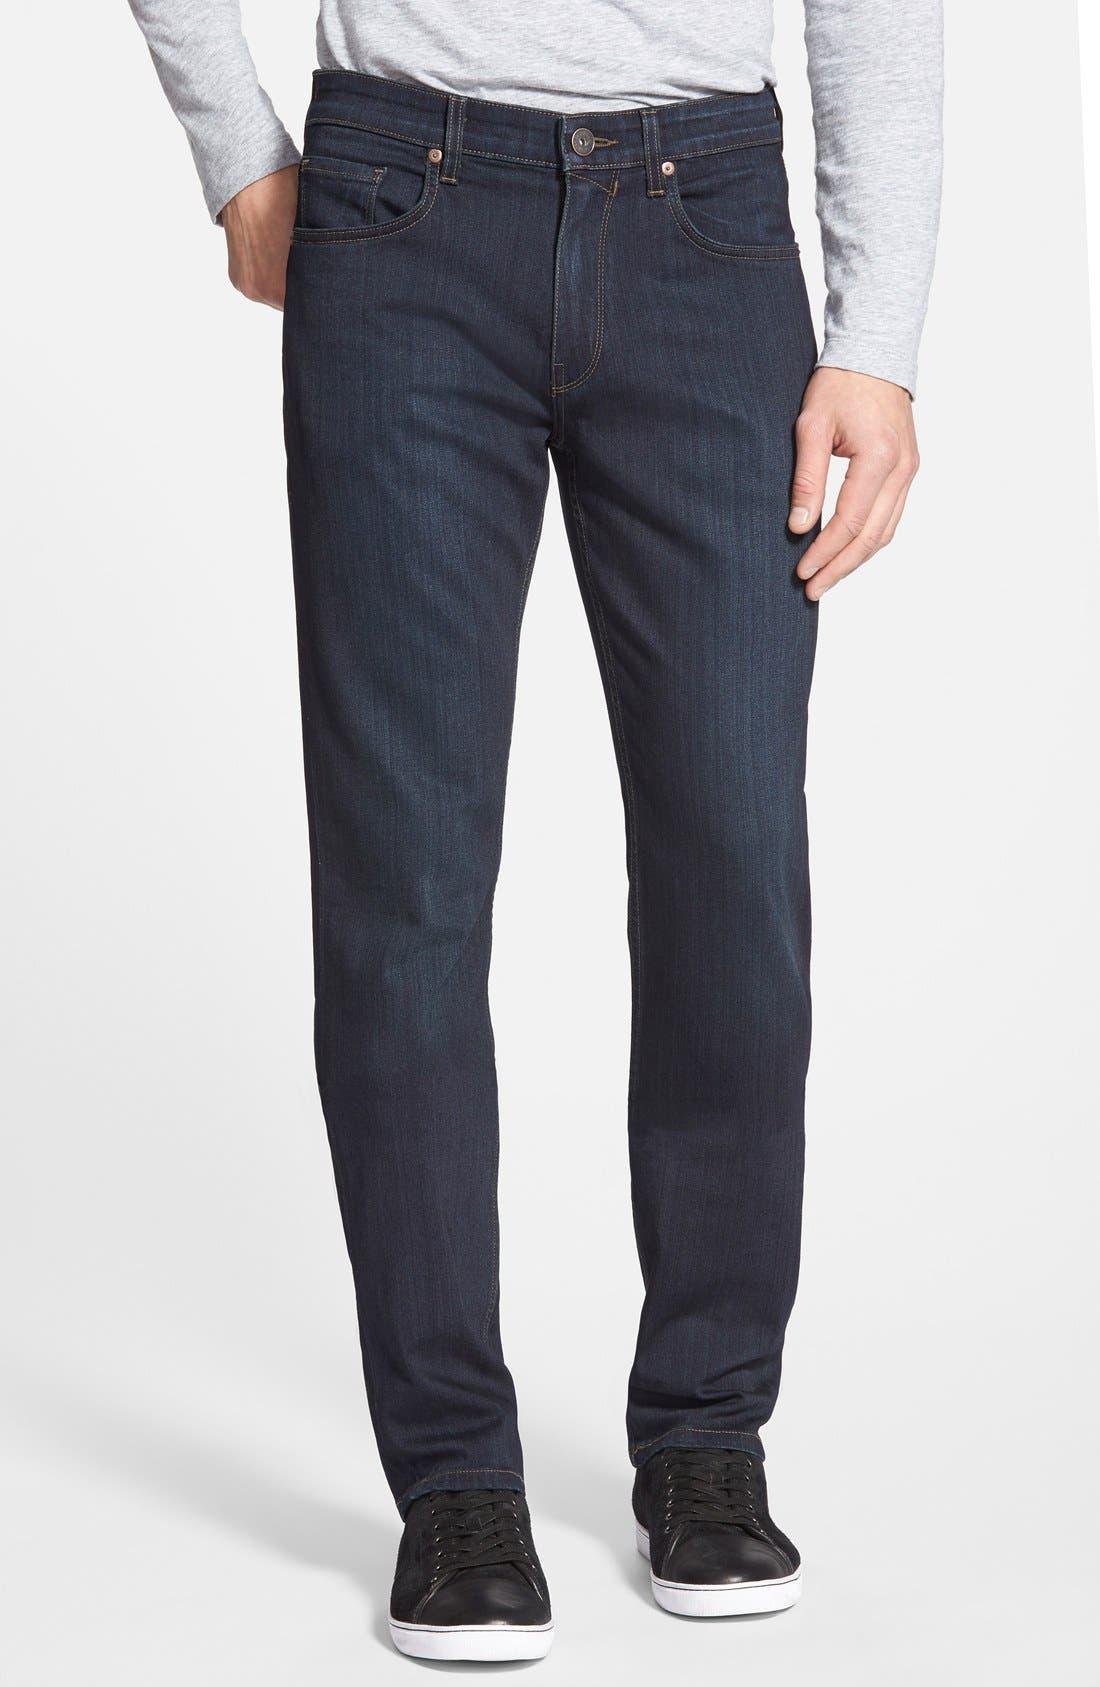 PAIGE Transcend - Federal XL Slim Straight Leg Jeans, Main, color, CELLAR/ CELLAR